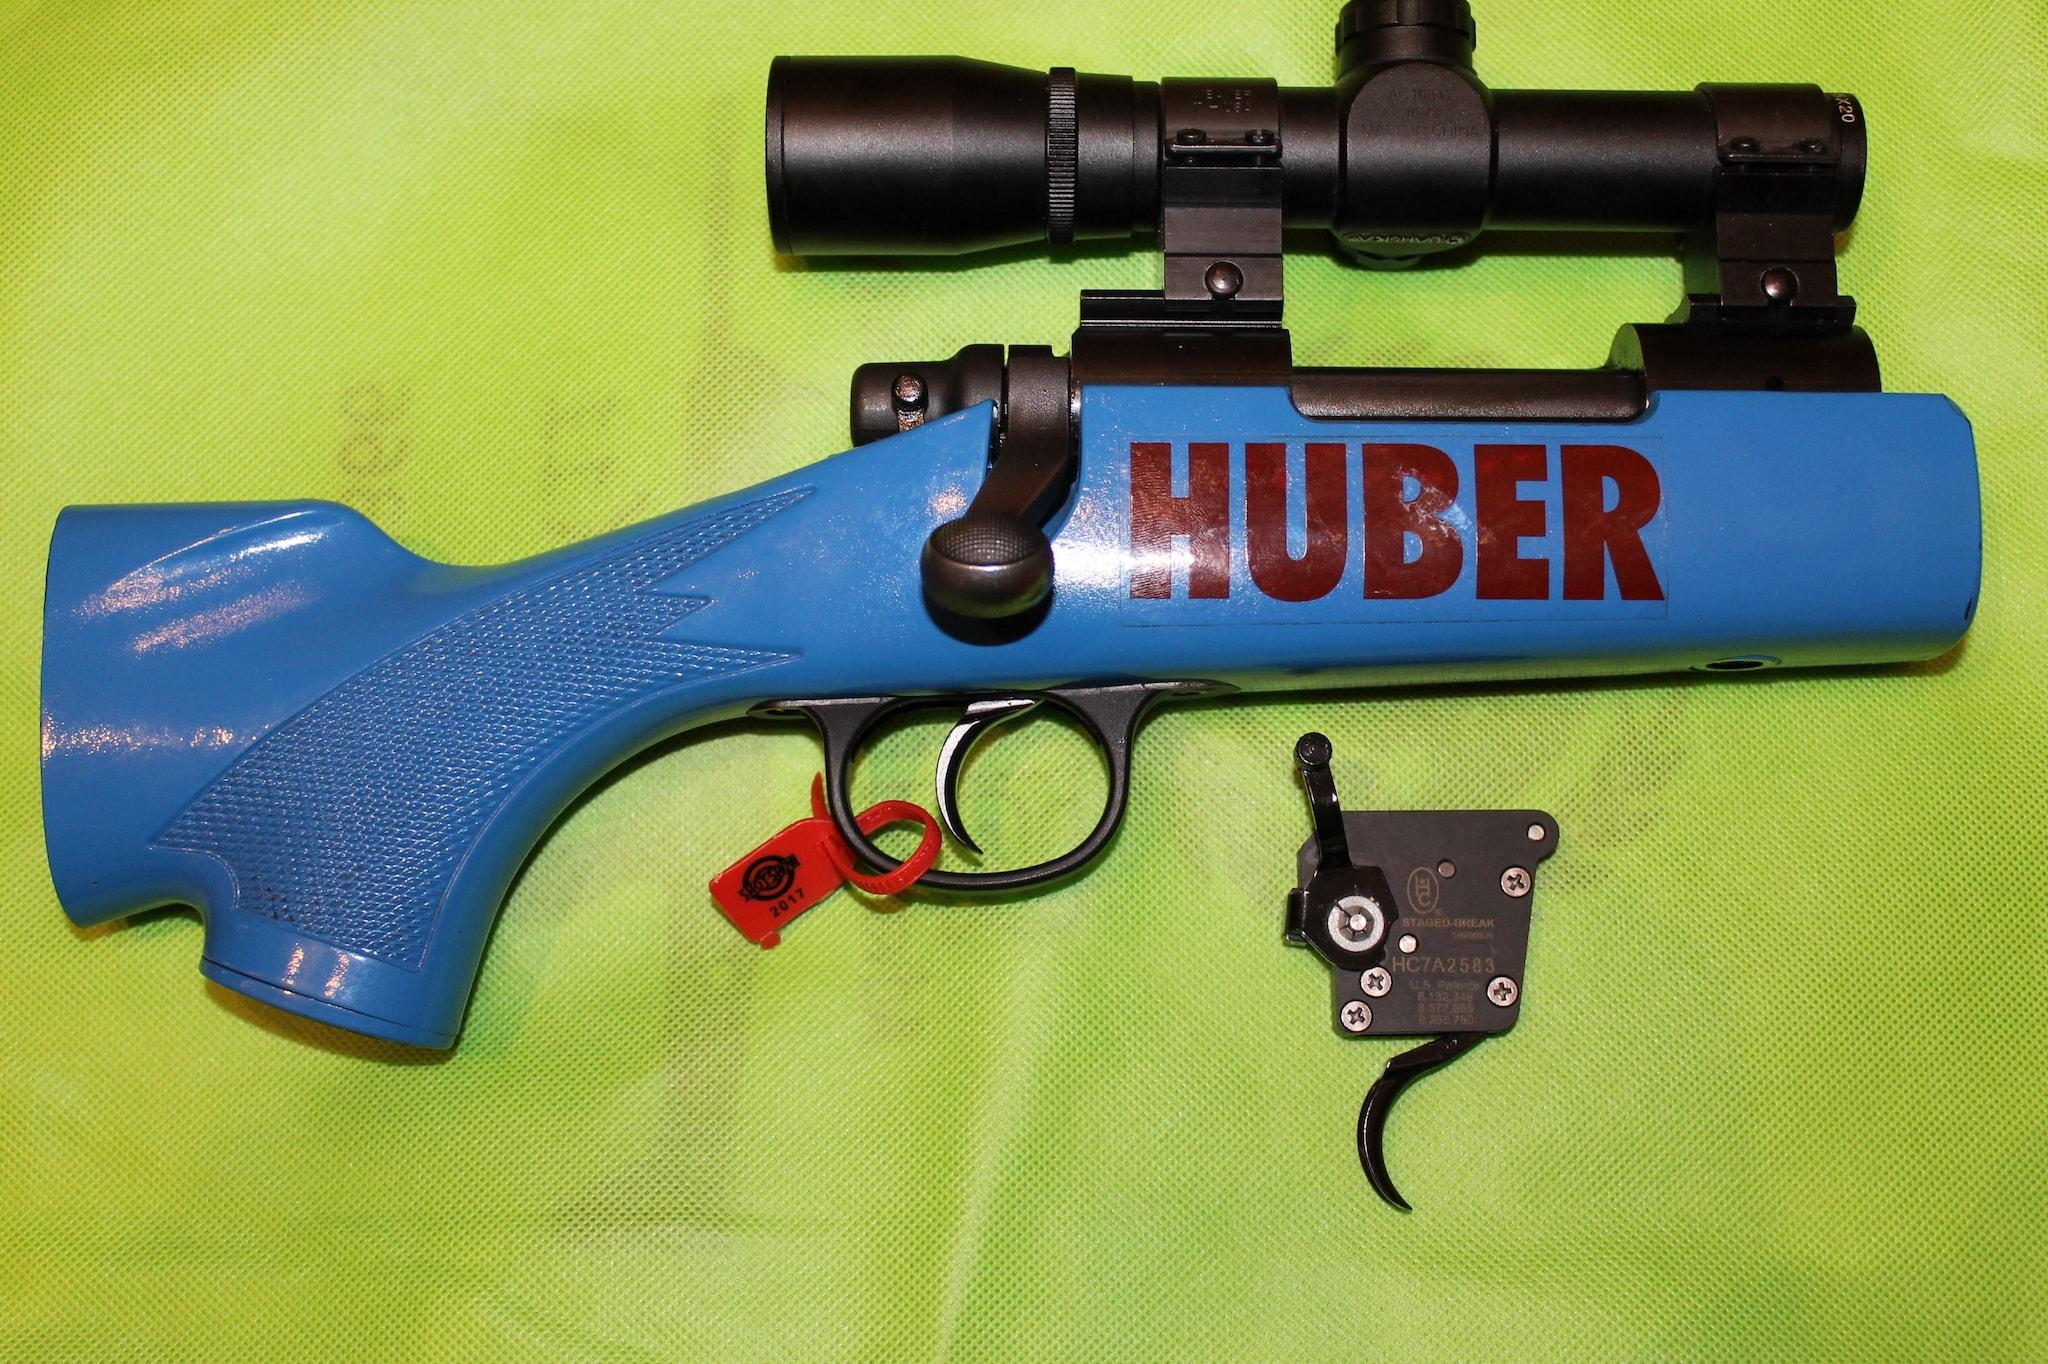 Huber roller bearing trigger